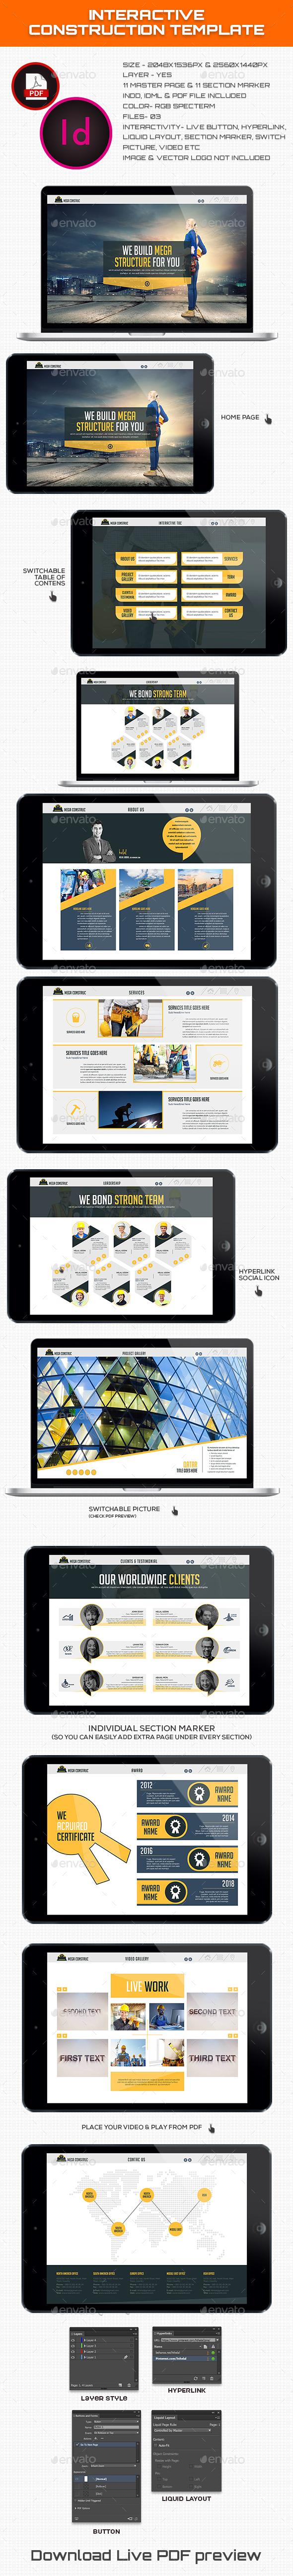 Interactive Construction Template - ePublishing